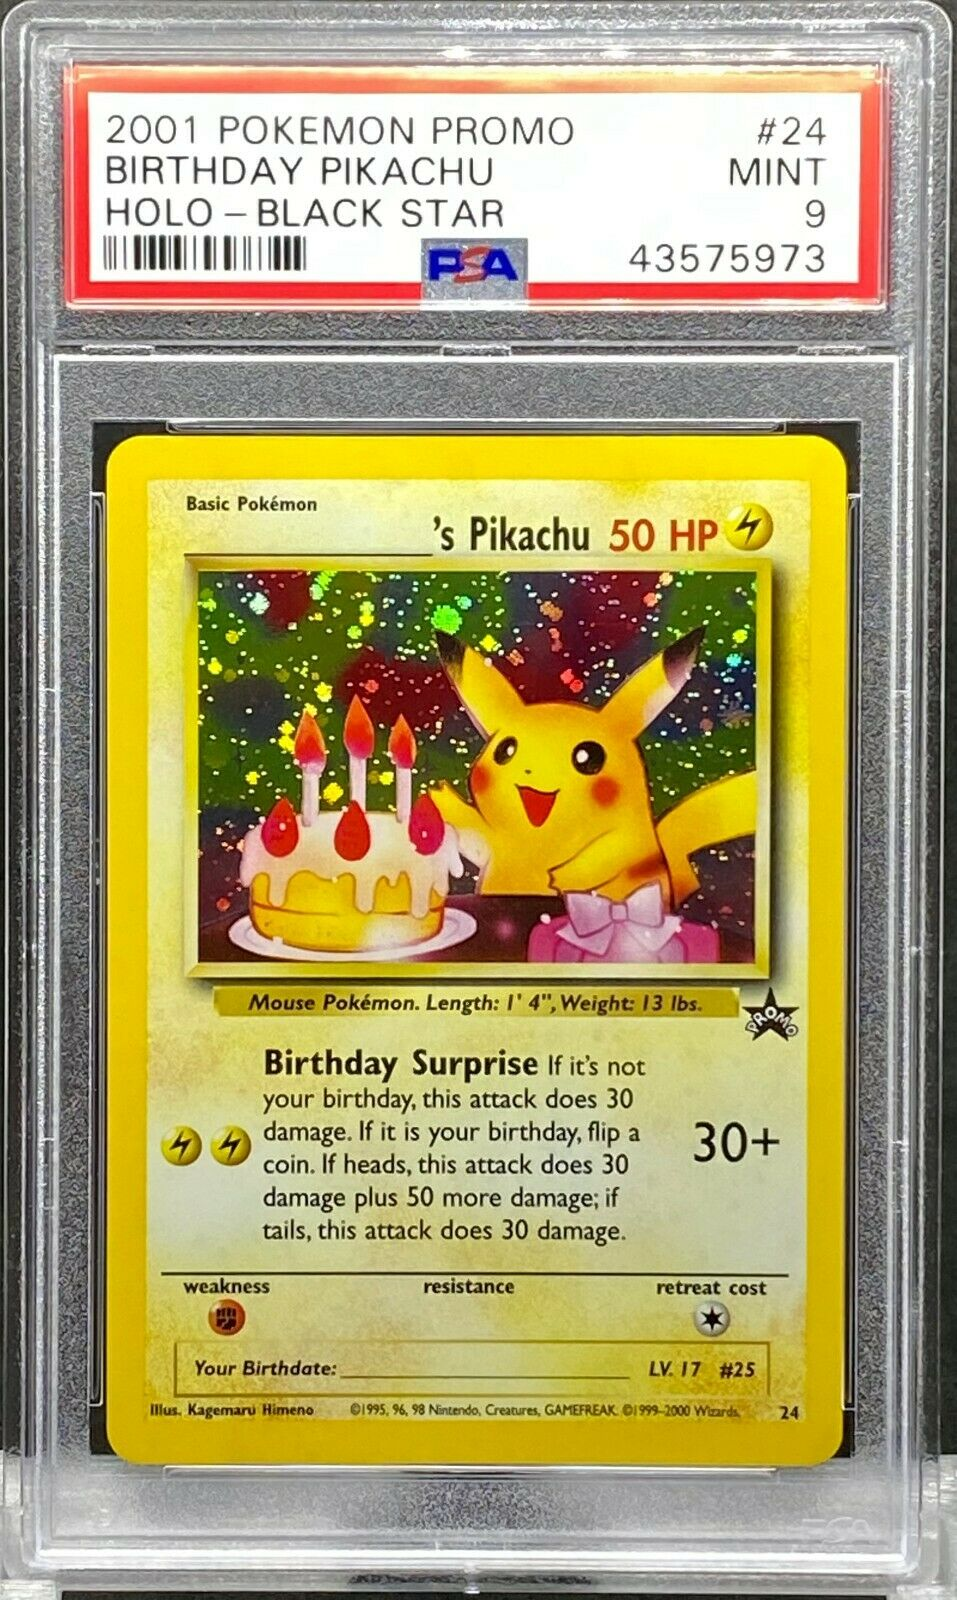 PSA 6 MINT 6 POKEMON BLACK STAR PROMO BIRTHDAY PIKACHU HOLO CARD #6 WOTC